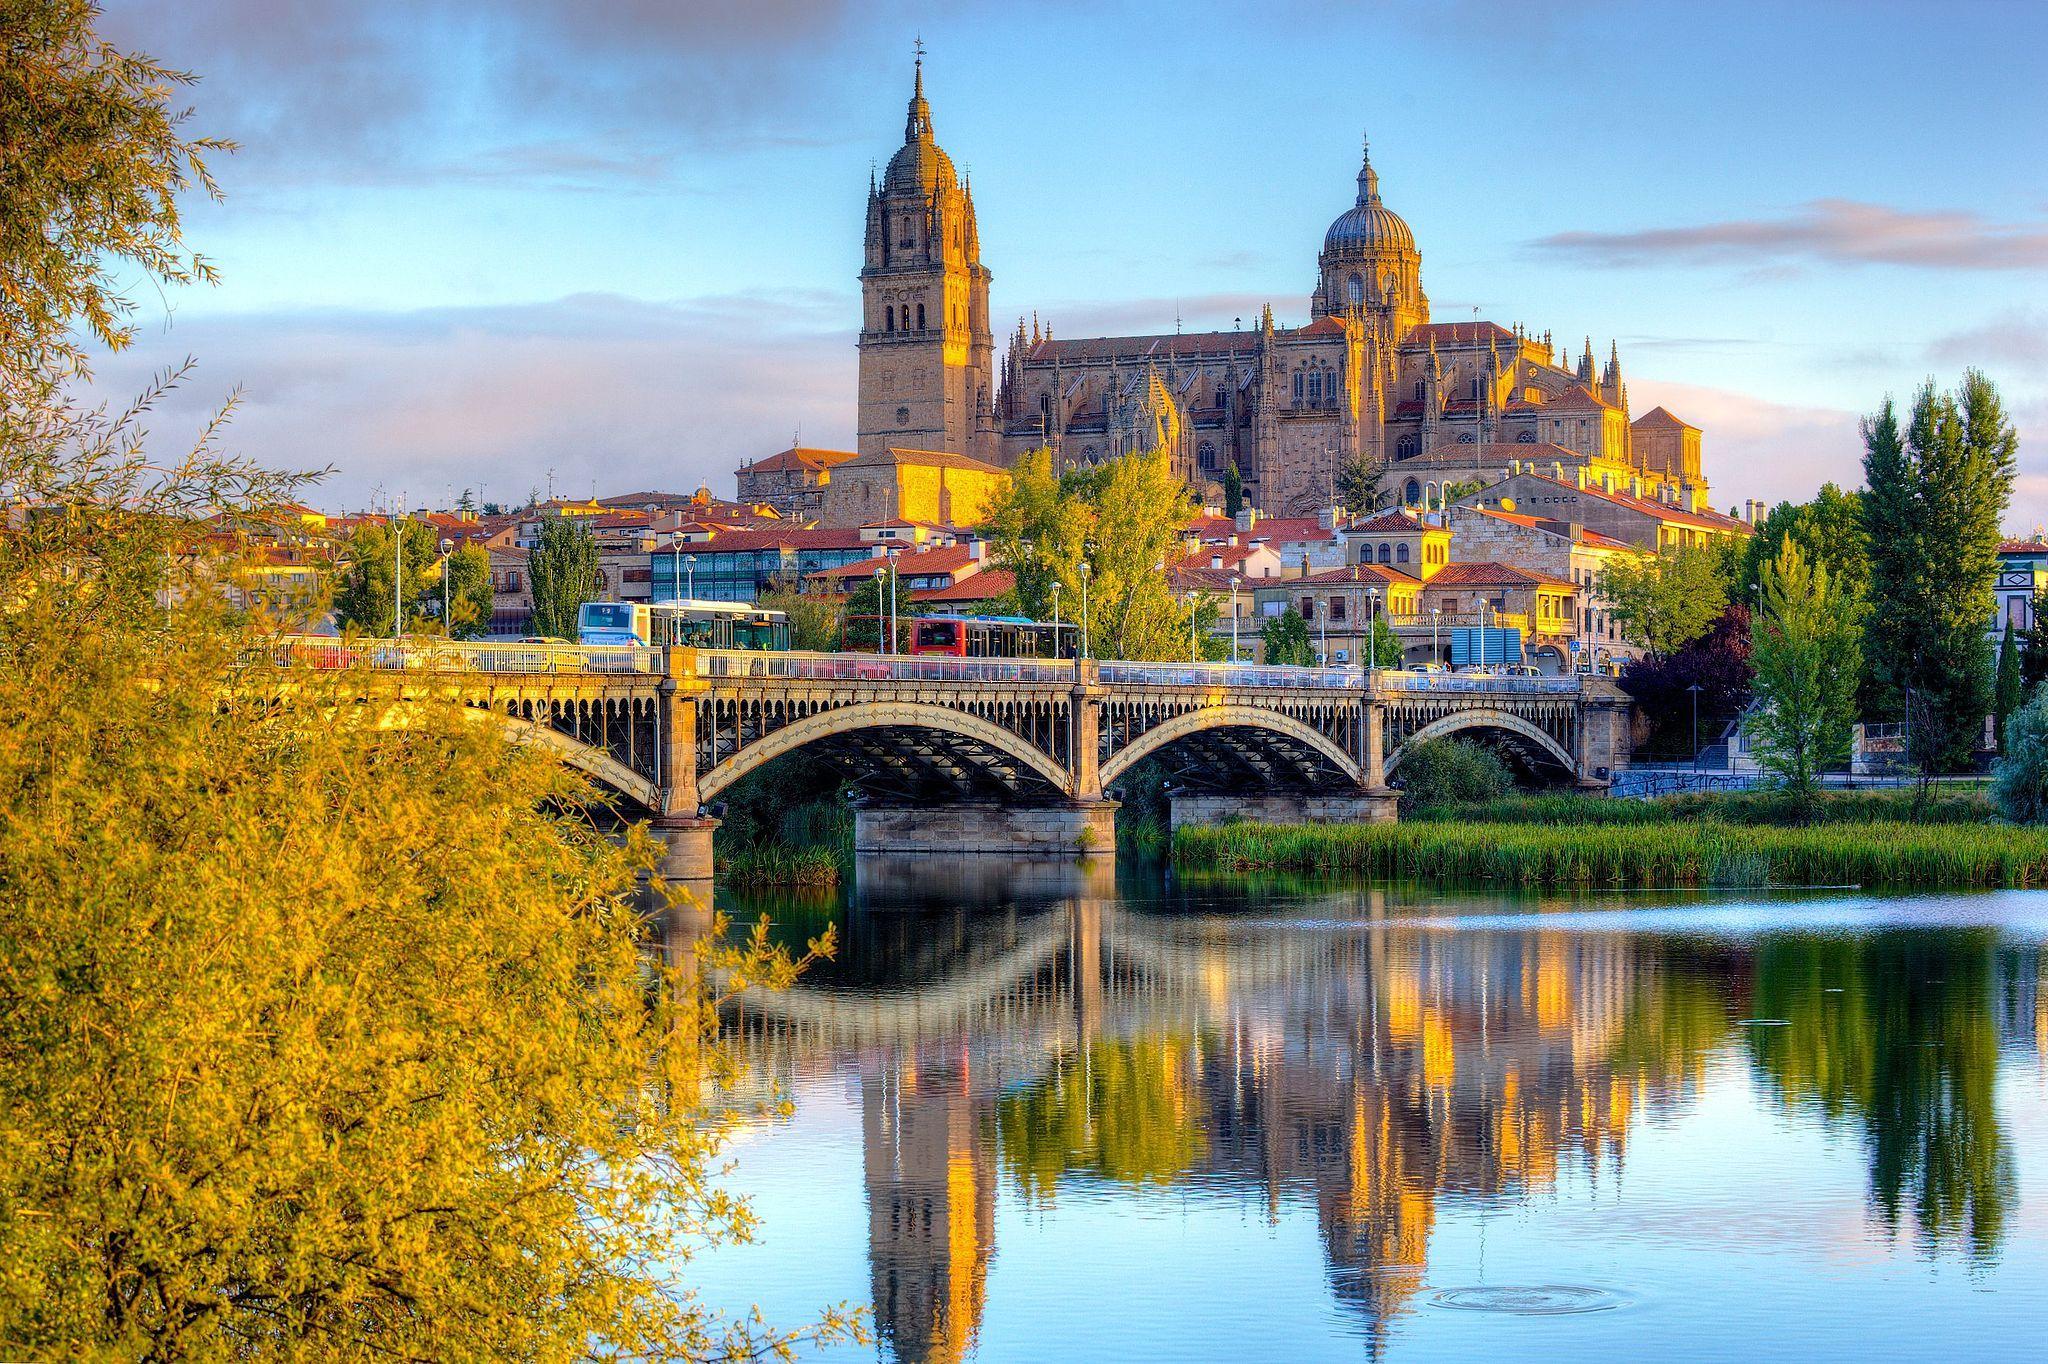 Our #Blog: #OffTheBeatenPath In Salamanca http://oleganatravelboutique.com/off-the-beaten-path-in-spain-salamanca/?utm_content=buffer0ec13&utm_medium=social&utm_source=pinterest.com&utm_campaign=buffer #vacationwithotb #spain #salamanca #europe #honeymoon #travelbug #vacation